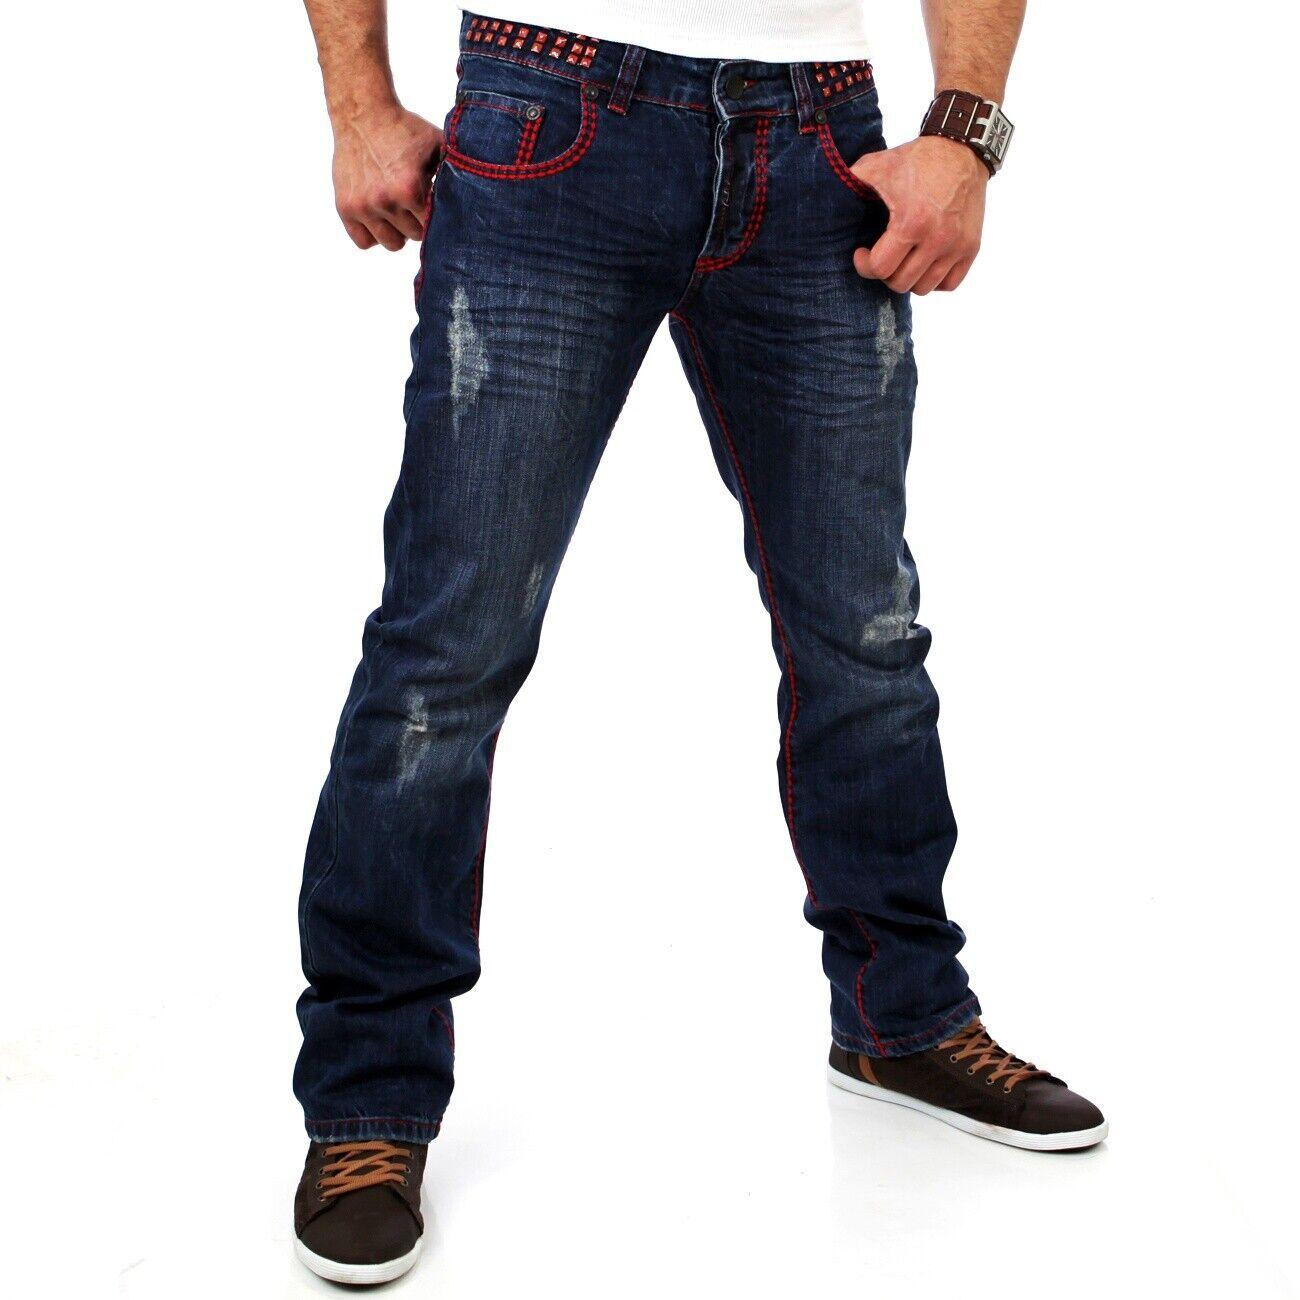 Tazzio Herren Jeanshose Männer Jeans Rote Kontrastnaht